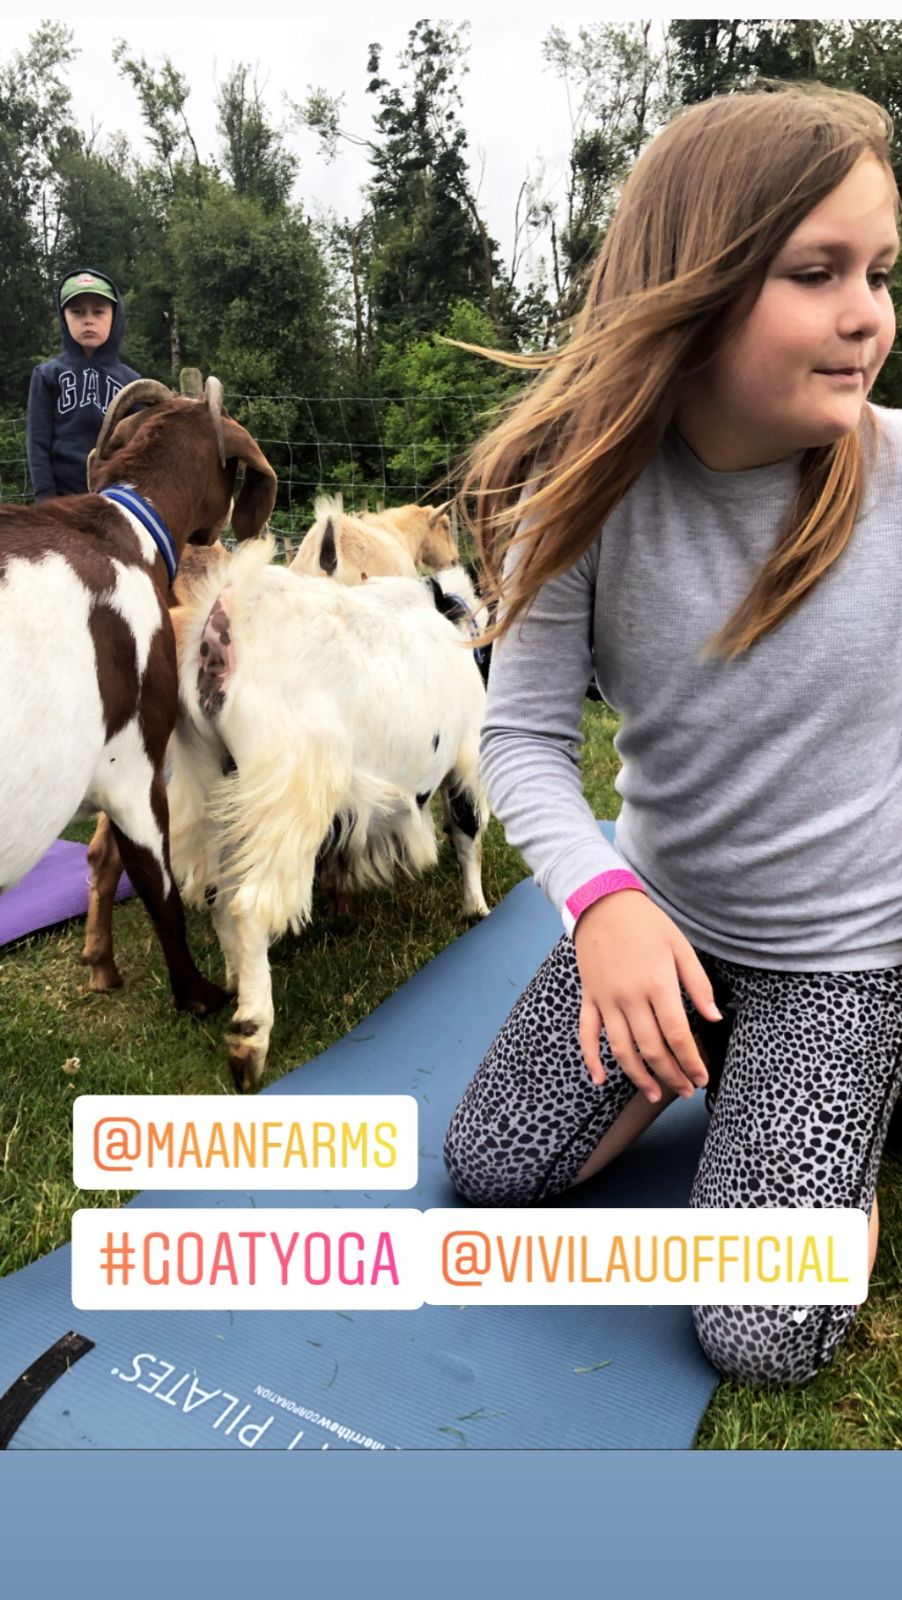 Goat Yoga World Record Attempt